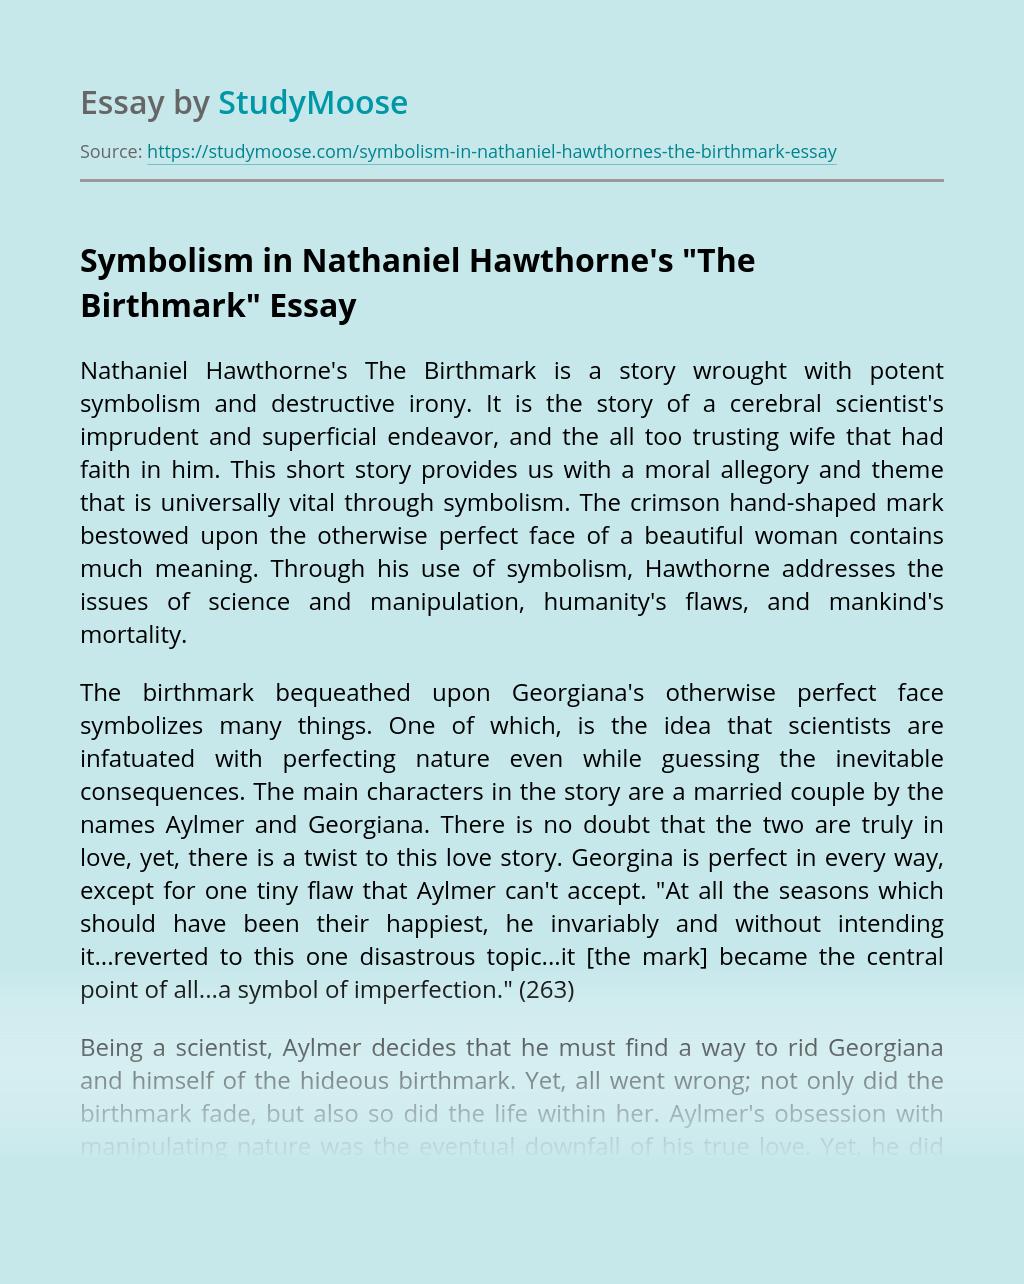 Symbolism in Nathaniel Hawthorne's